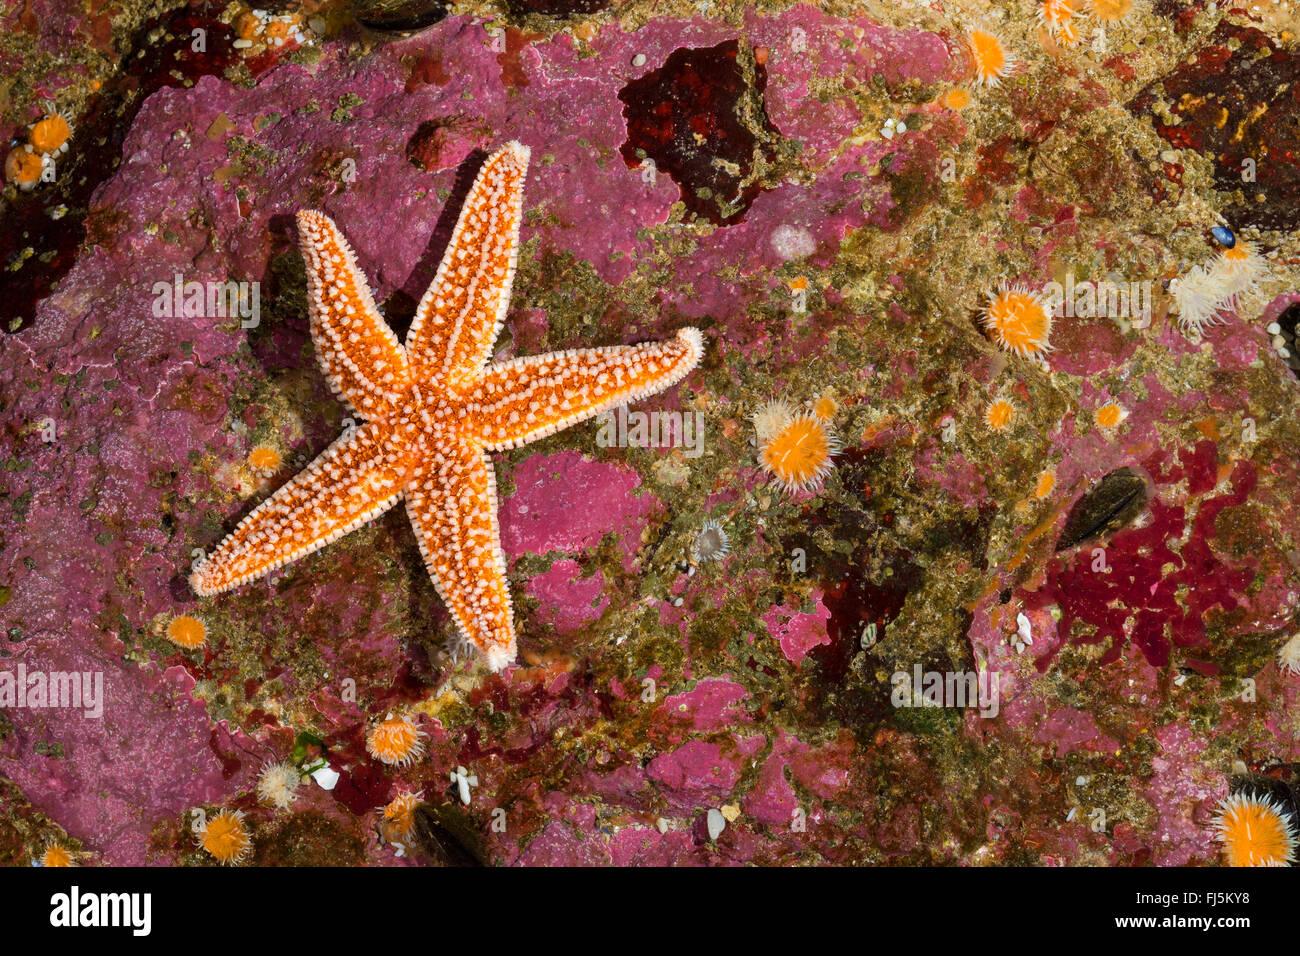 common starfish, common European seastar (Asterias rubens), at reef - Stock Image